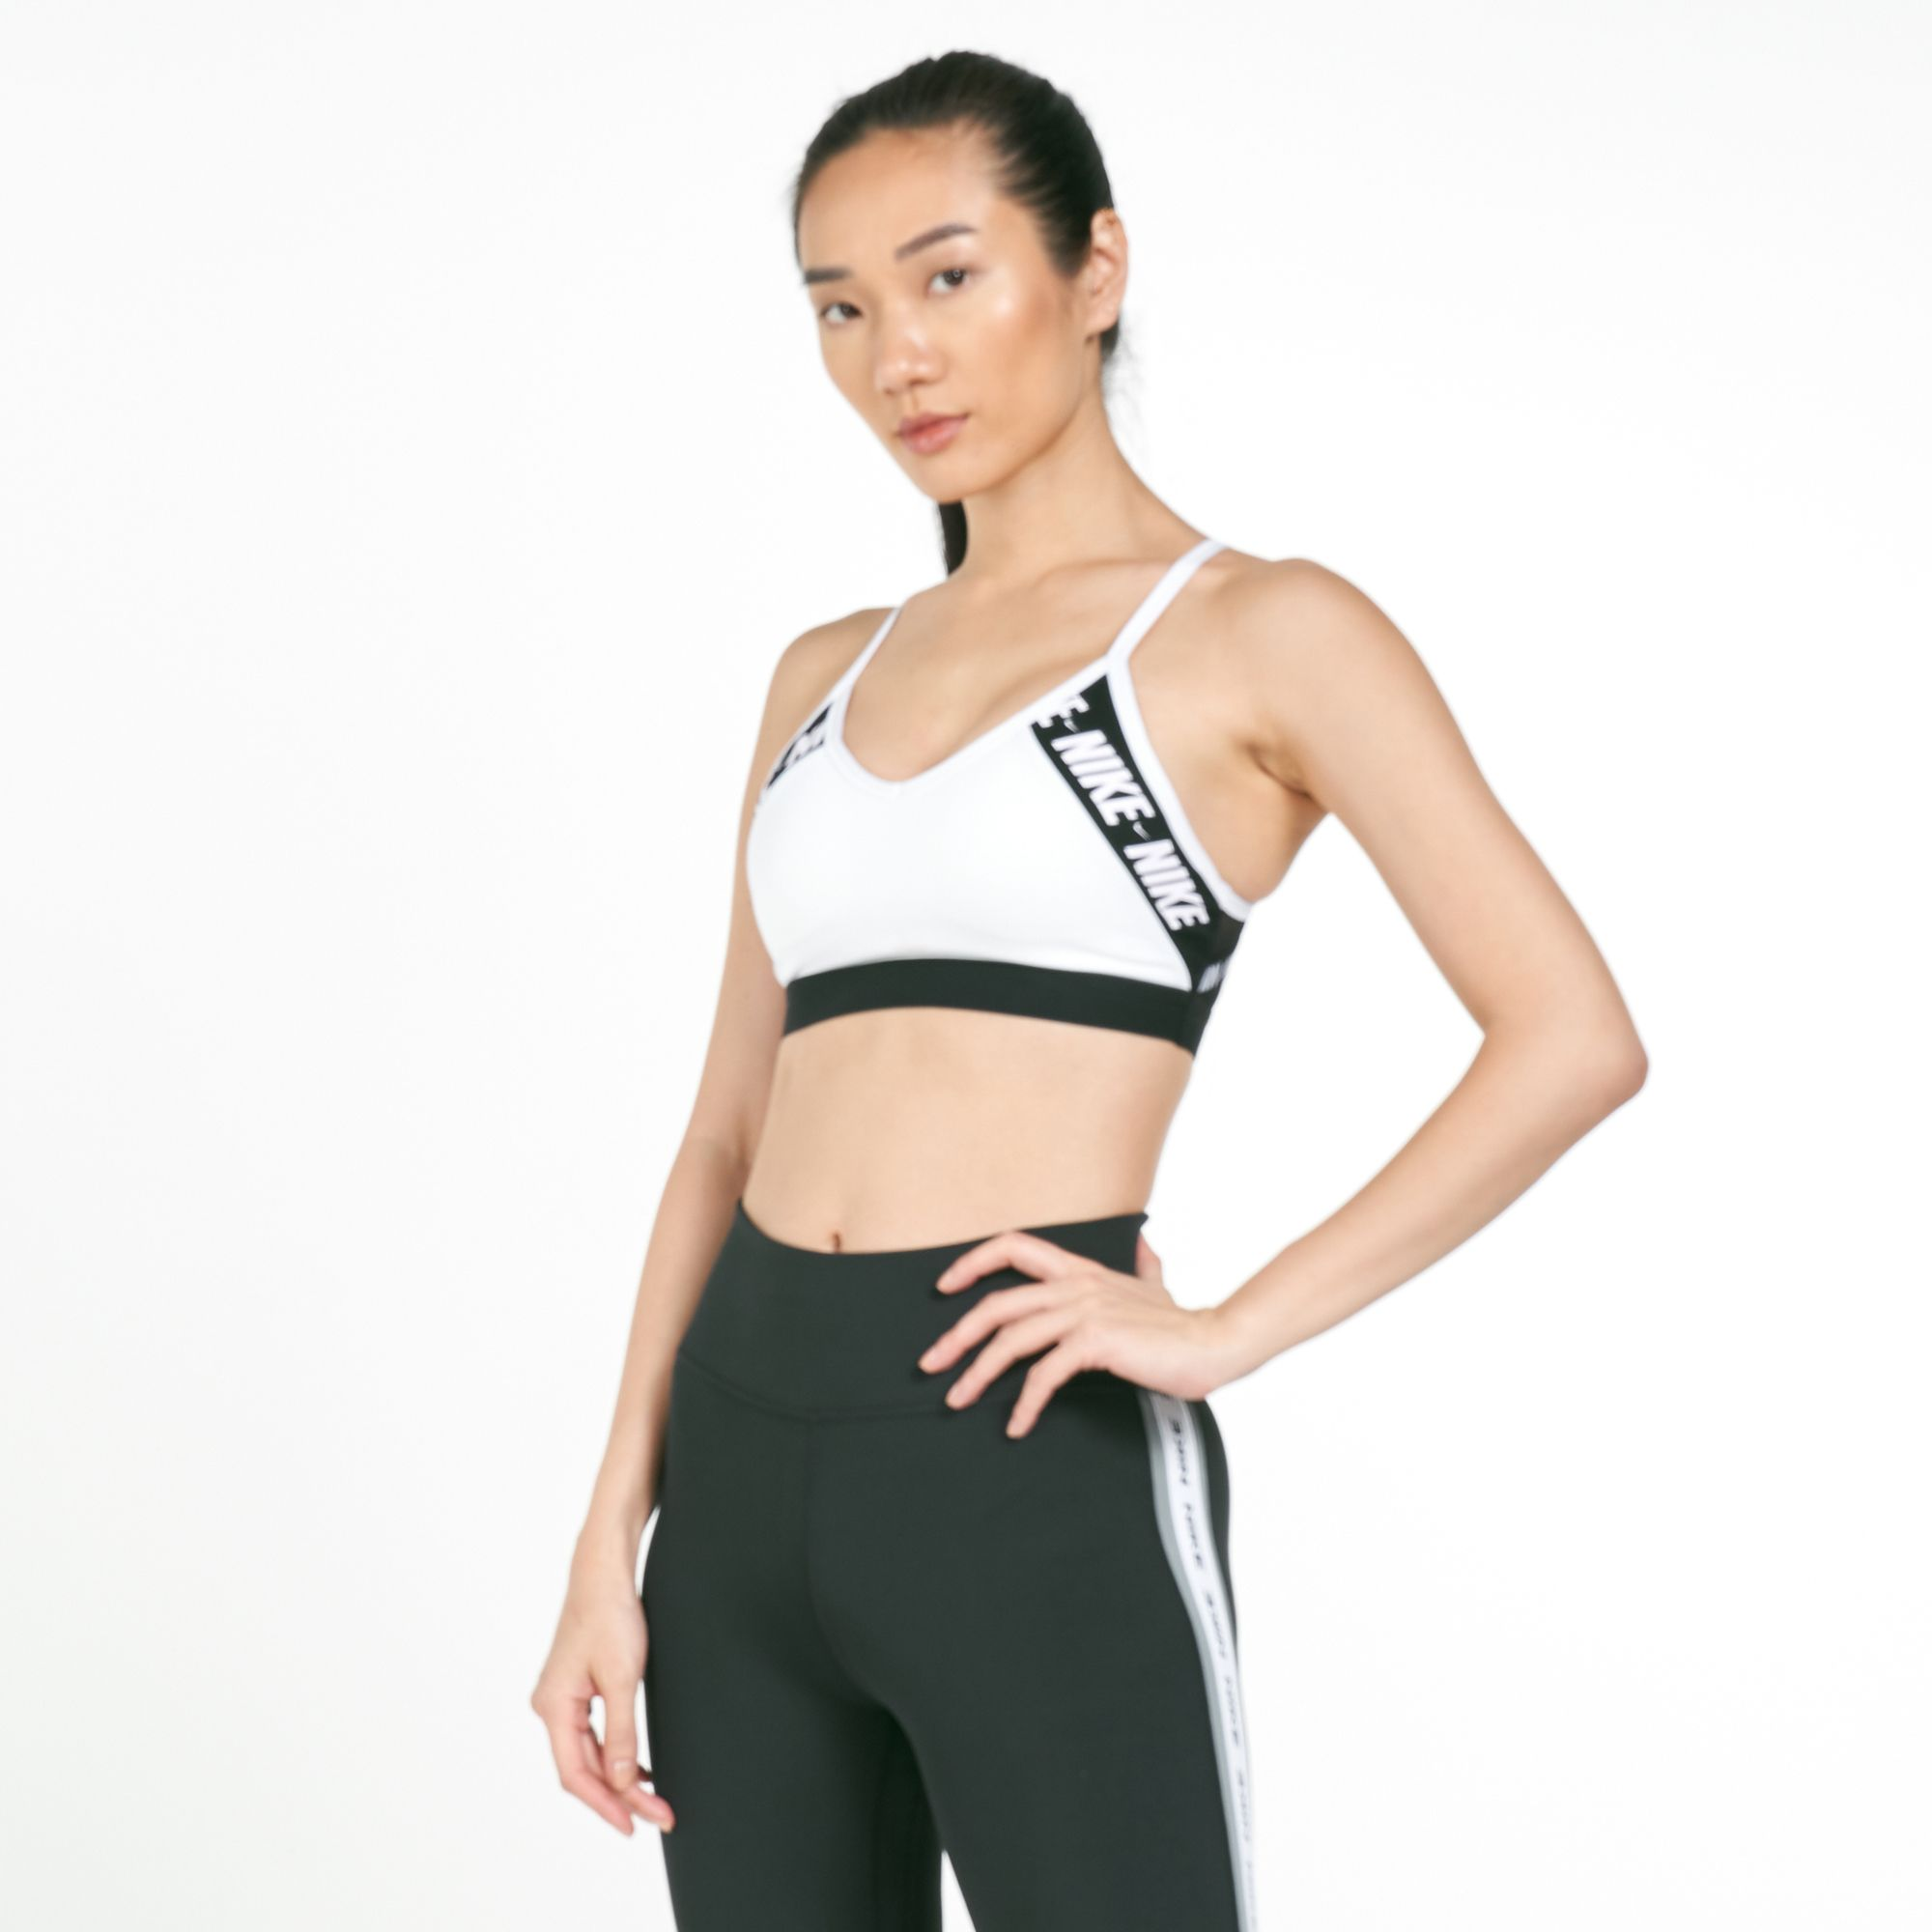 Nike Women S Indy Logo Sports Bra Sports Bra Clothing Women S Sale Ksa Sale Sss